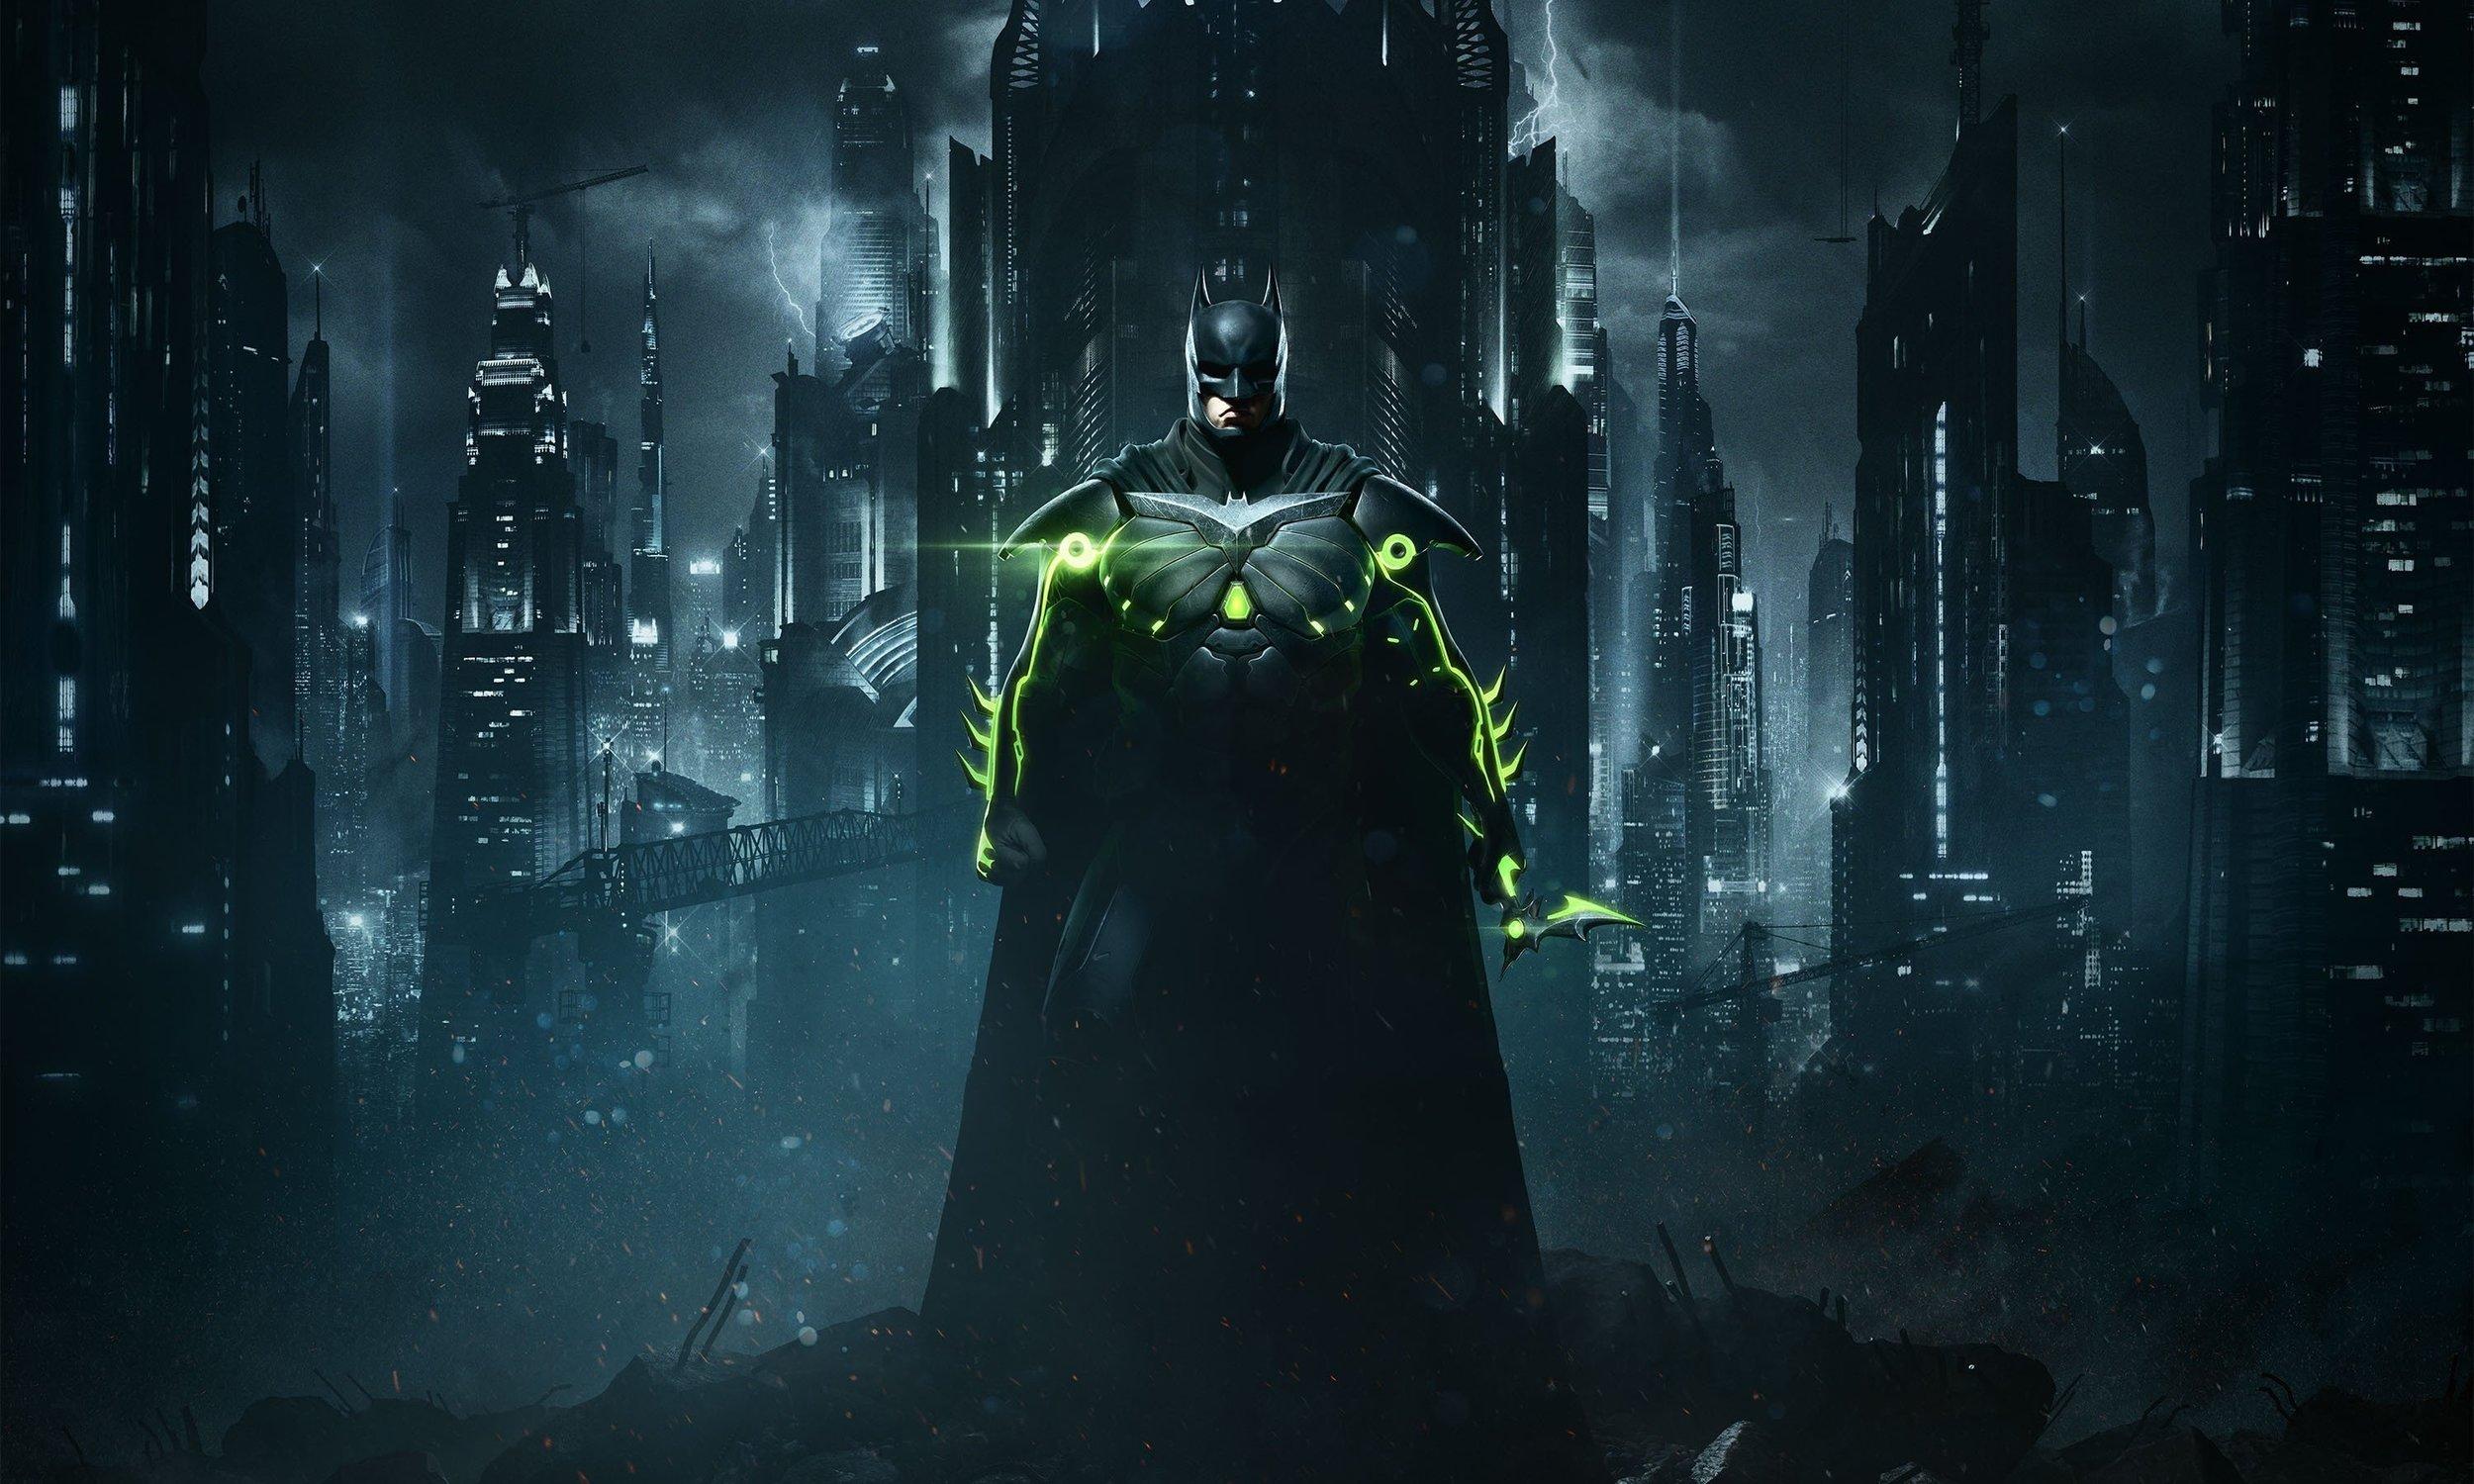 Otherworlds Tabletop RPG - Batman Injustice 2